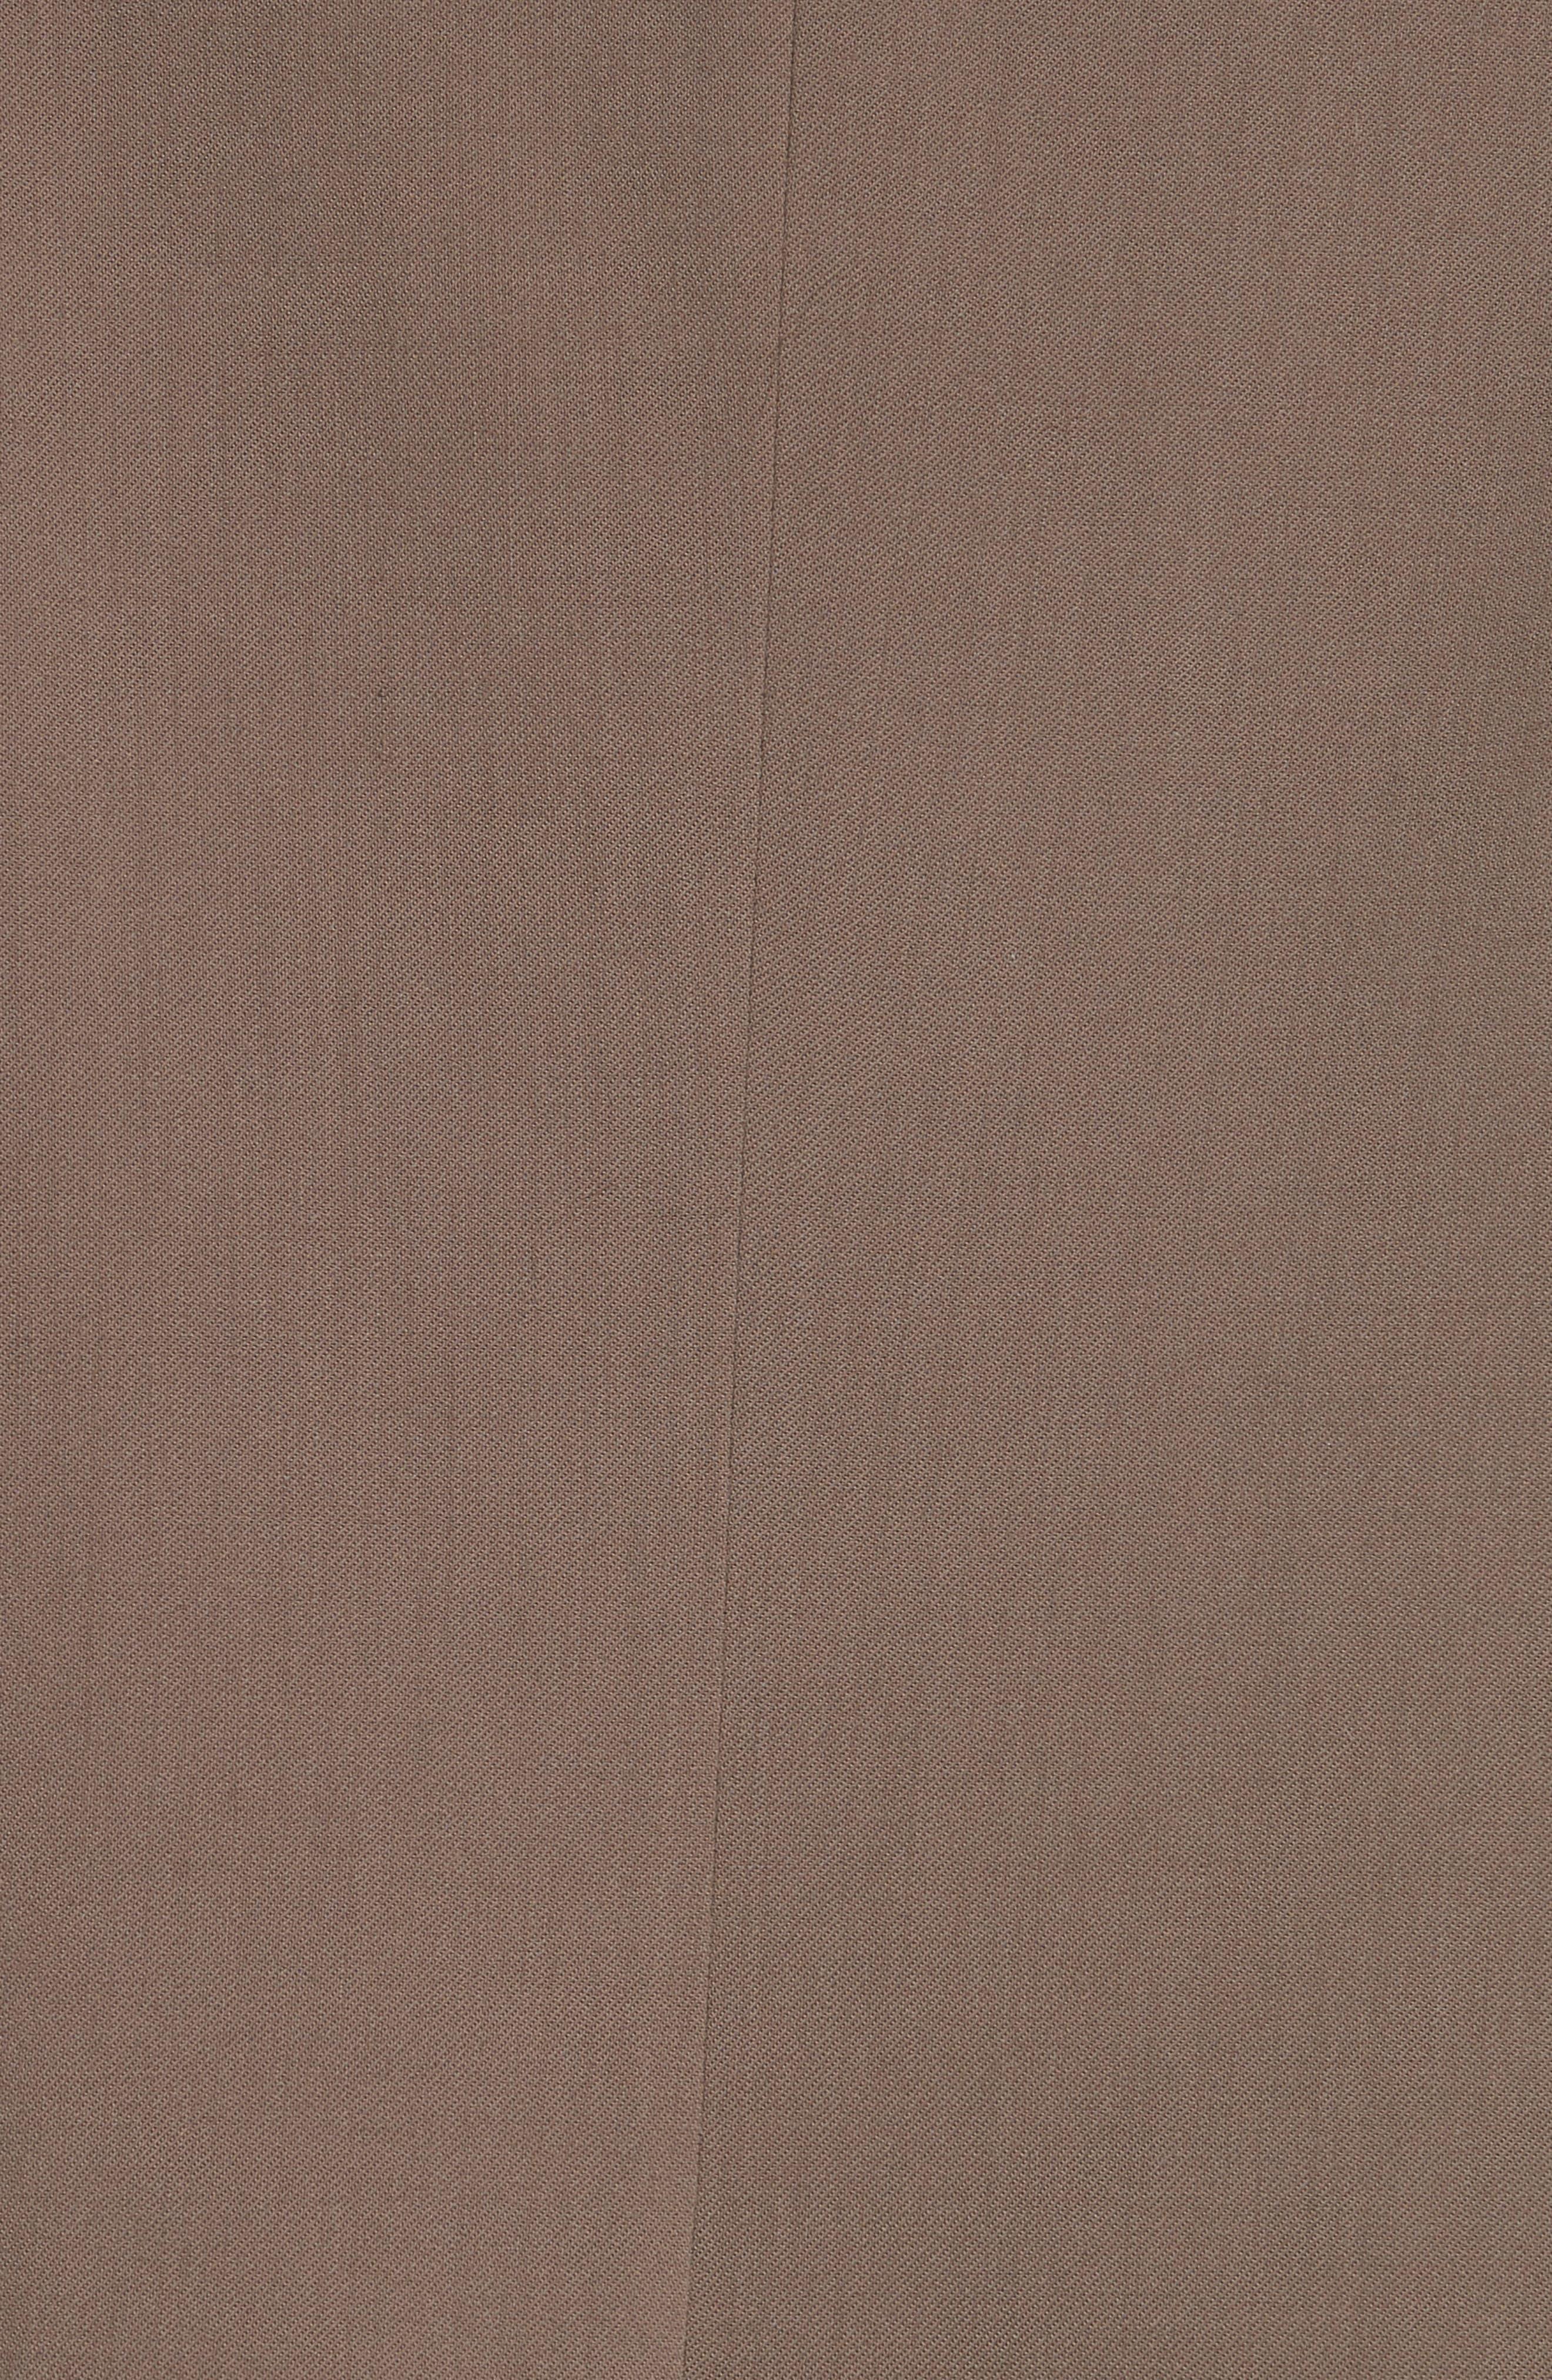 ALEXANDER WANG,                             Leather Cuff Blazer,                             Alternate thumbnail 7, color,                             KHAKI GREEN